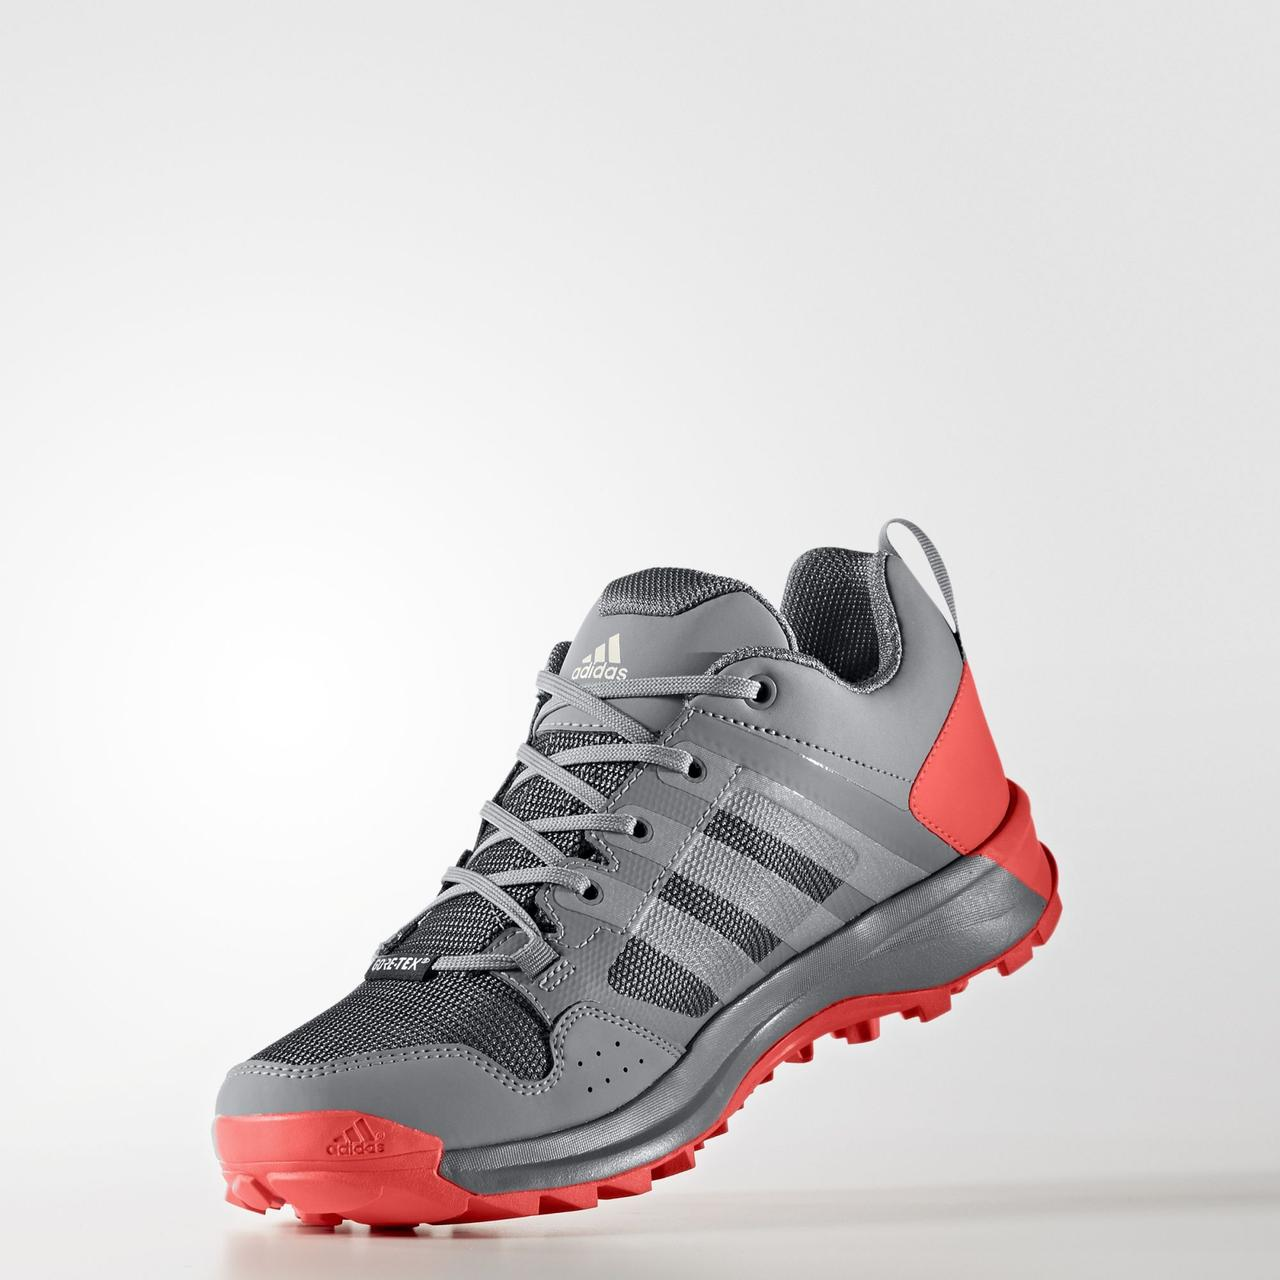 5e49f7a2f122 Женские кроссовки Adidas Performance Terrex Kanadia 7 Trail GTX (Артикул   S80837) - Адидас